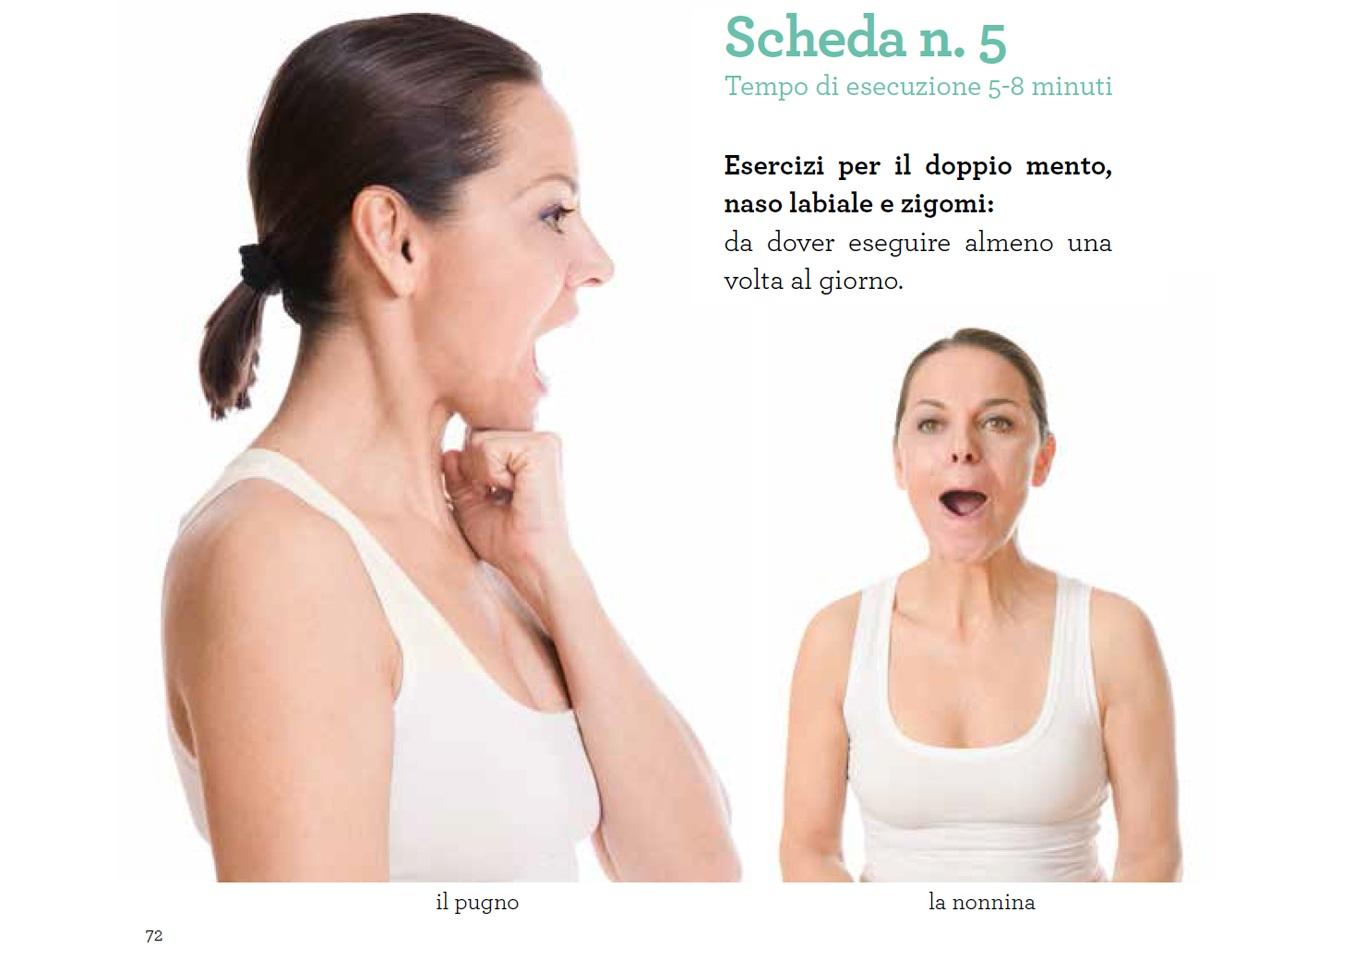 La curcuma di maschera per problema affronta la pelle